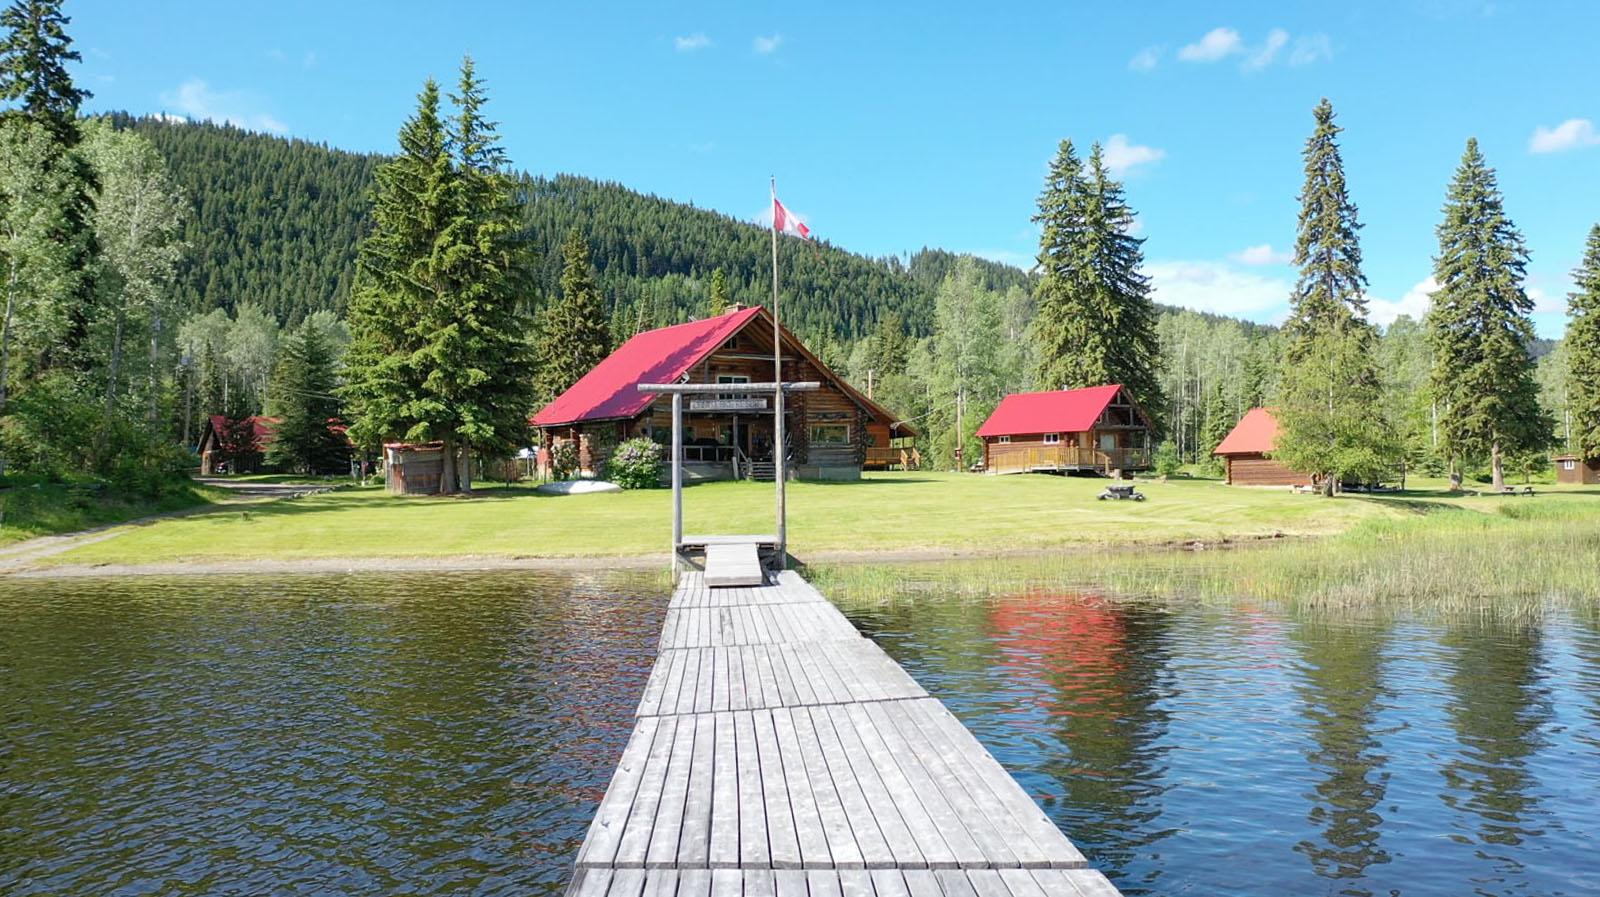 Canim lake resort 18